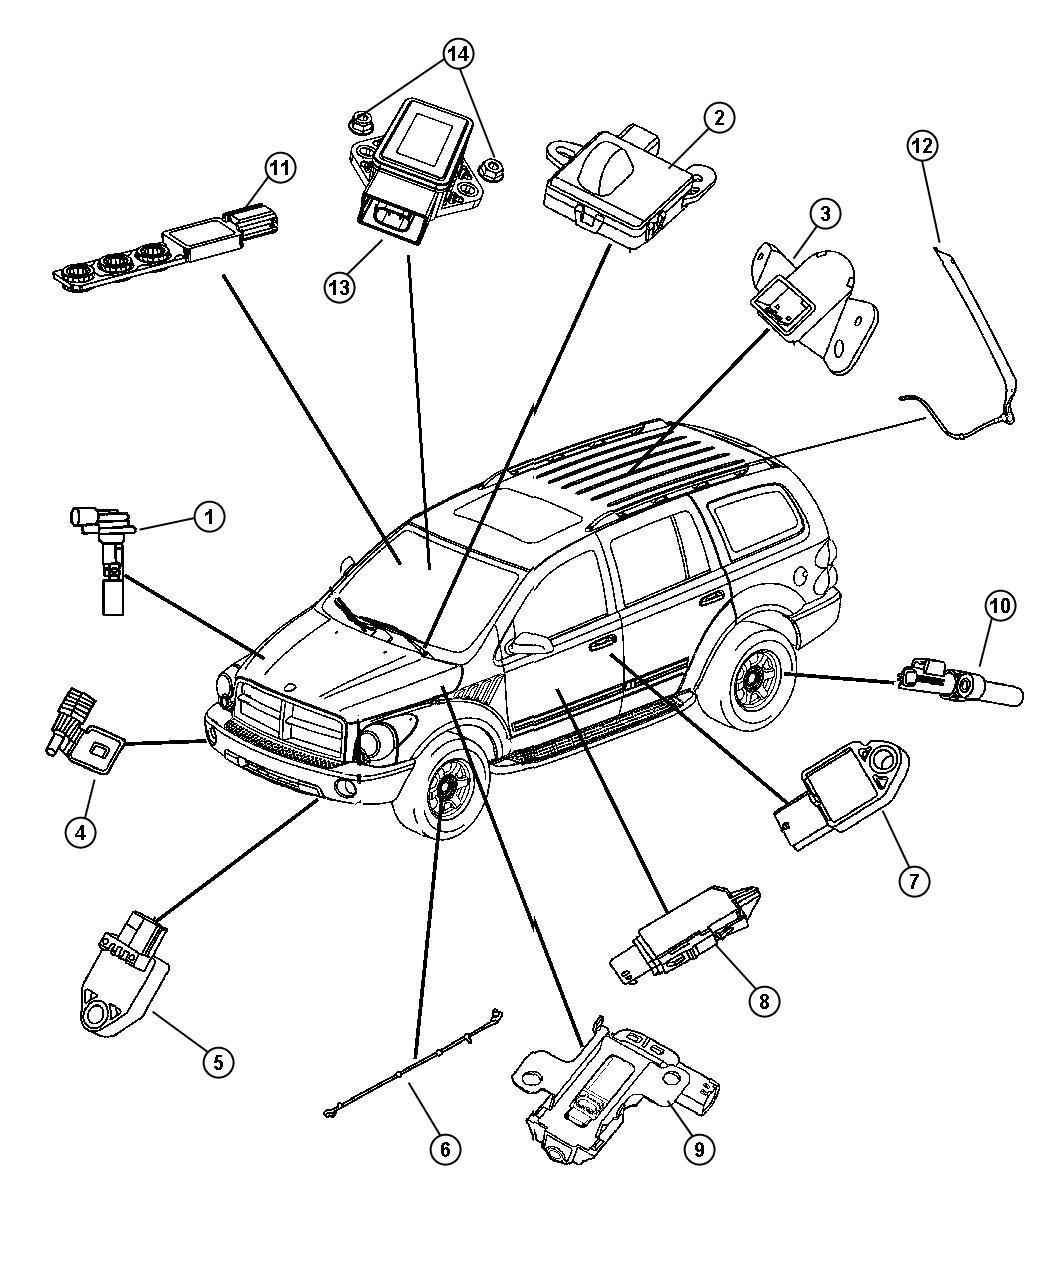 2005 Chrysler 300 Sensor. Seat track position. Trim: (*zl